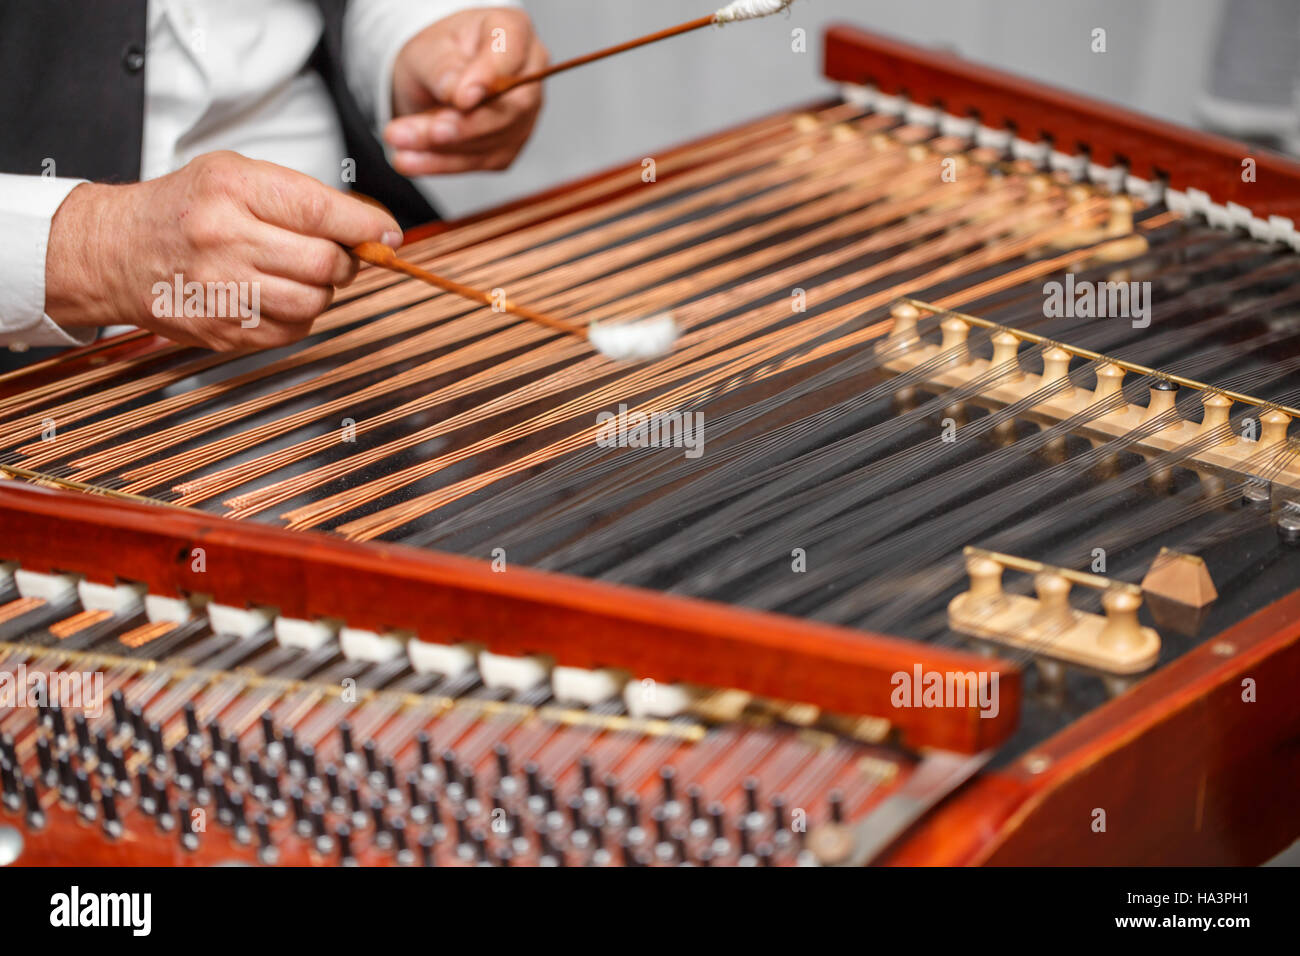 Playing the dulcimer folk musical instrument Stock Photo